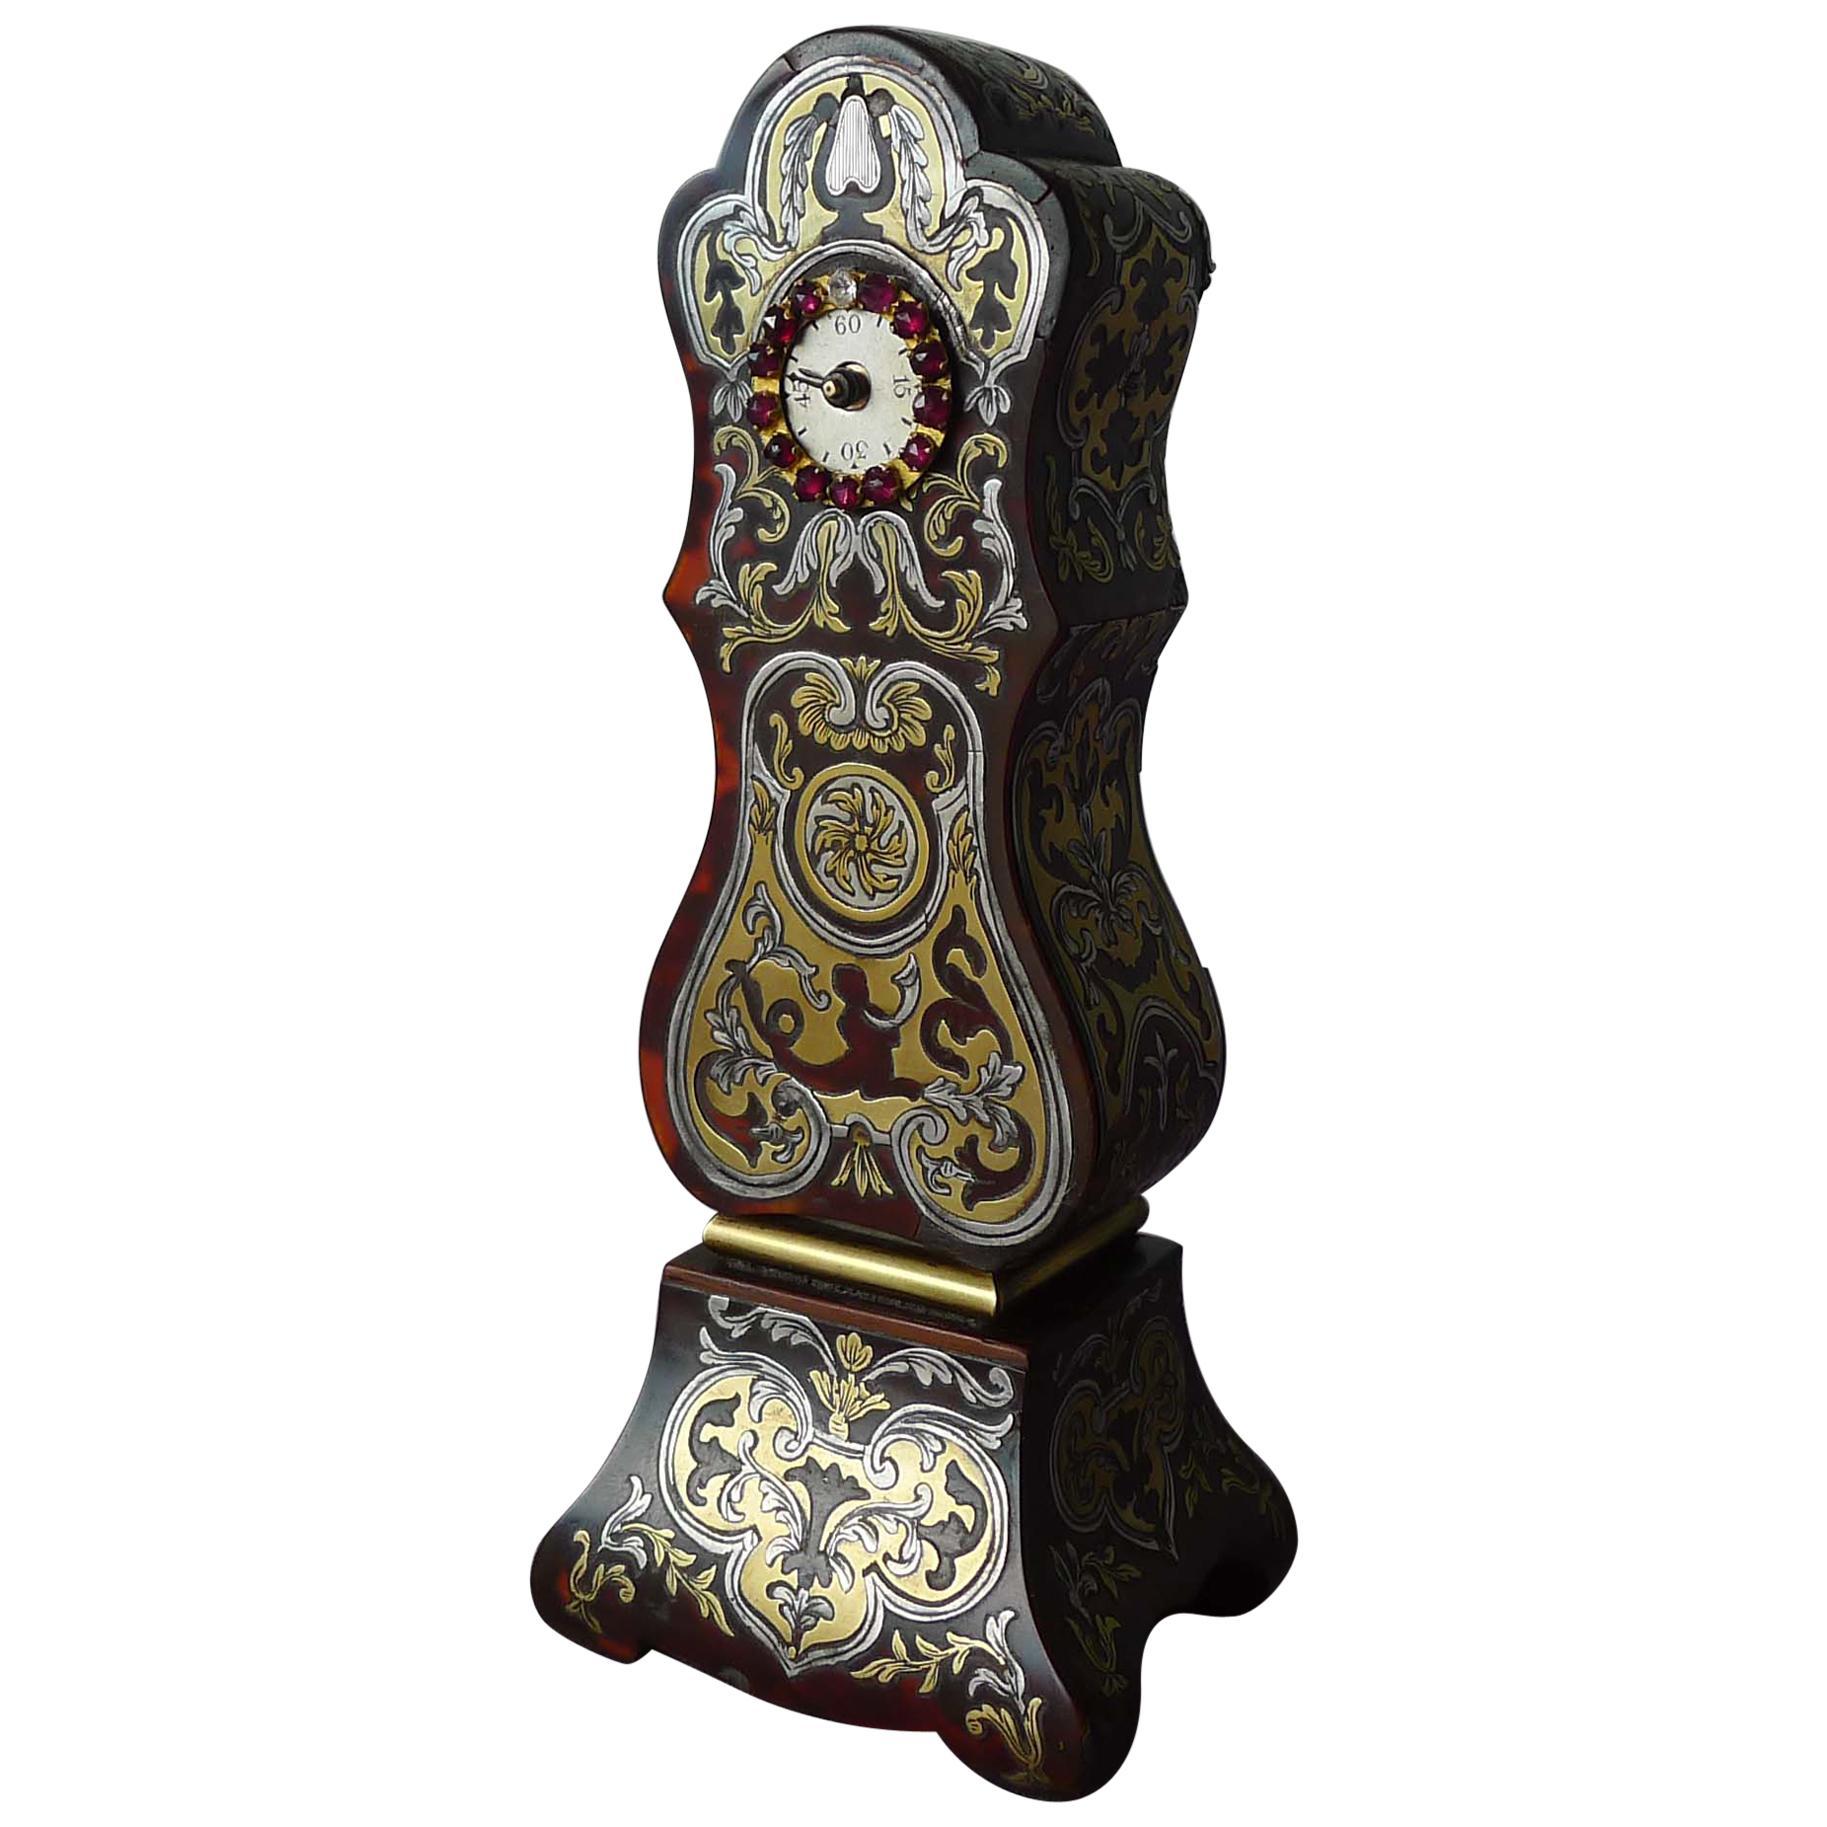 Miniature Scarlet Tortoiseshell, Pewter and Brass Boulle Longcase Clock